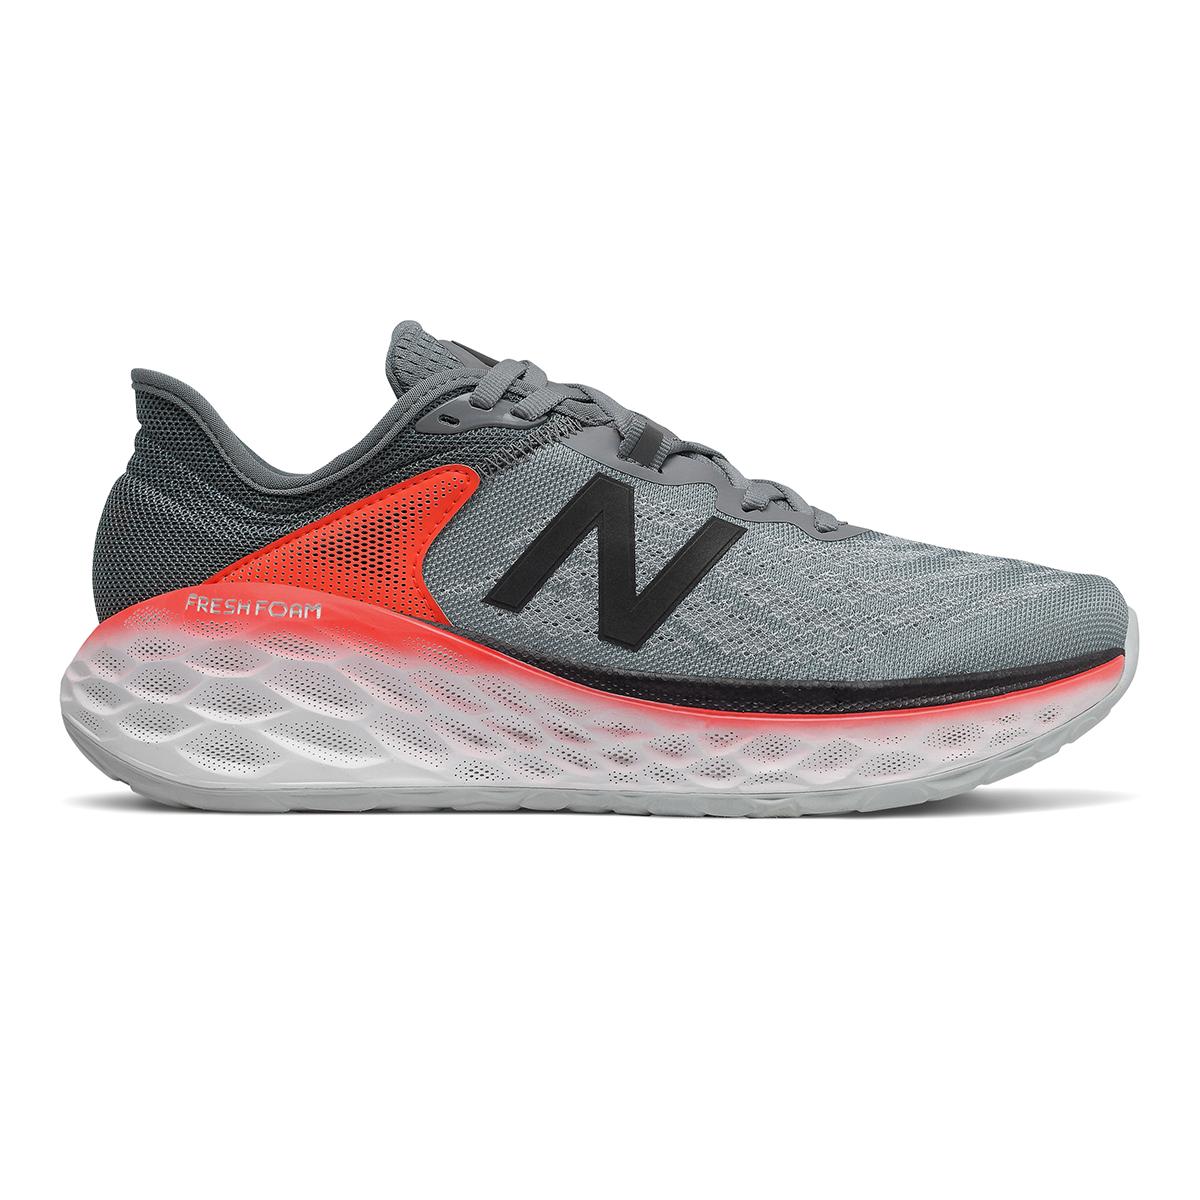 Men's New Balance Fresh Foam More V2 Running Shoe - Color: Gunmetal - Size: 7 - Width: Wide, Gunmetal, large, image 1